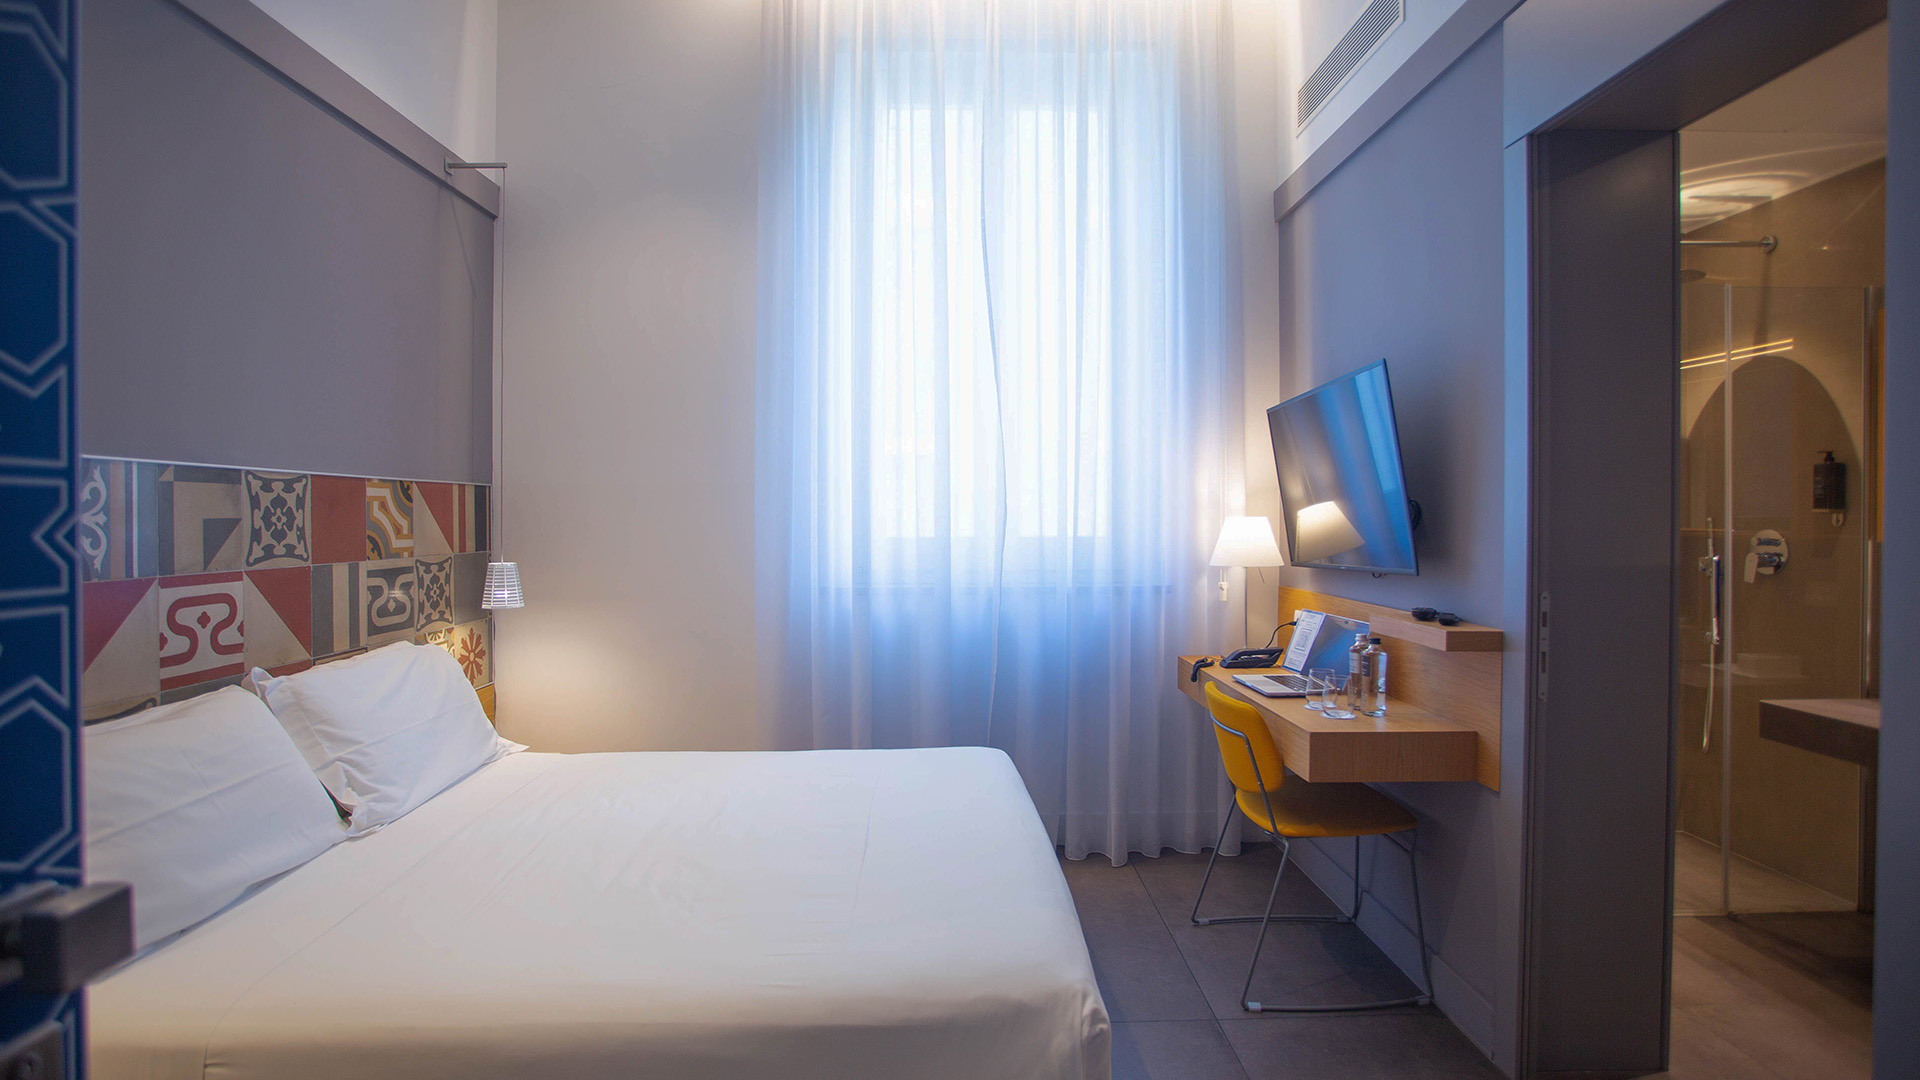 Hotel Medinblu-Reggio Calabria-Standard 01